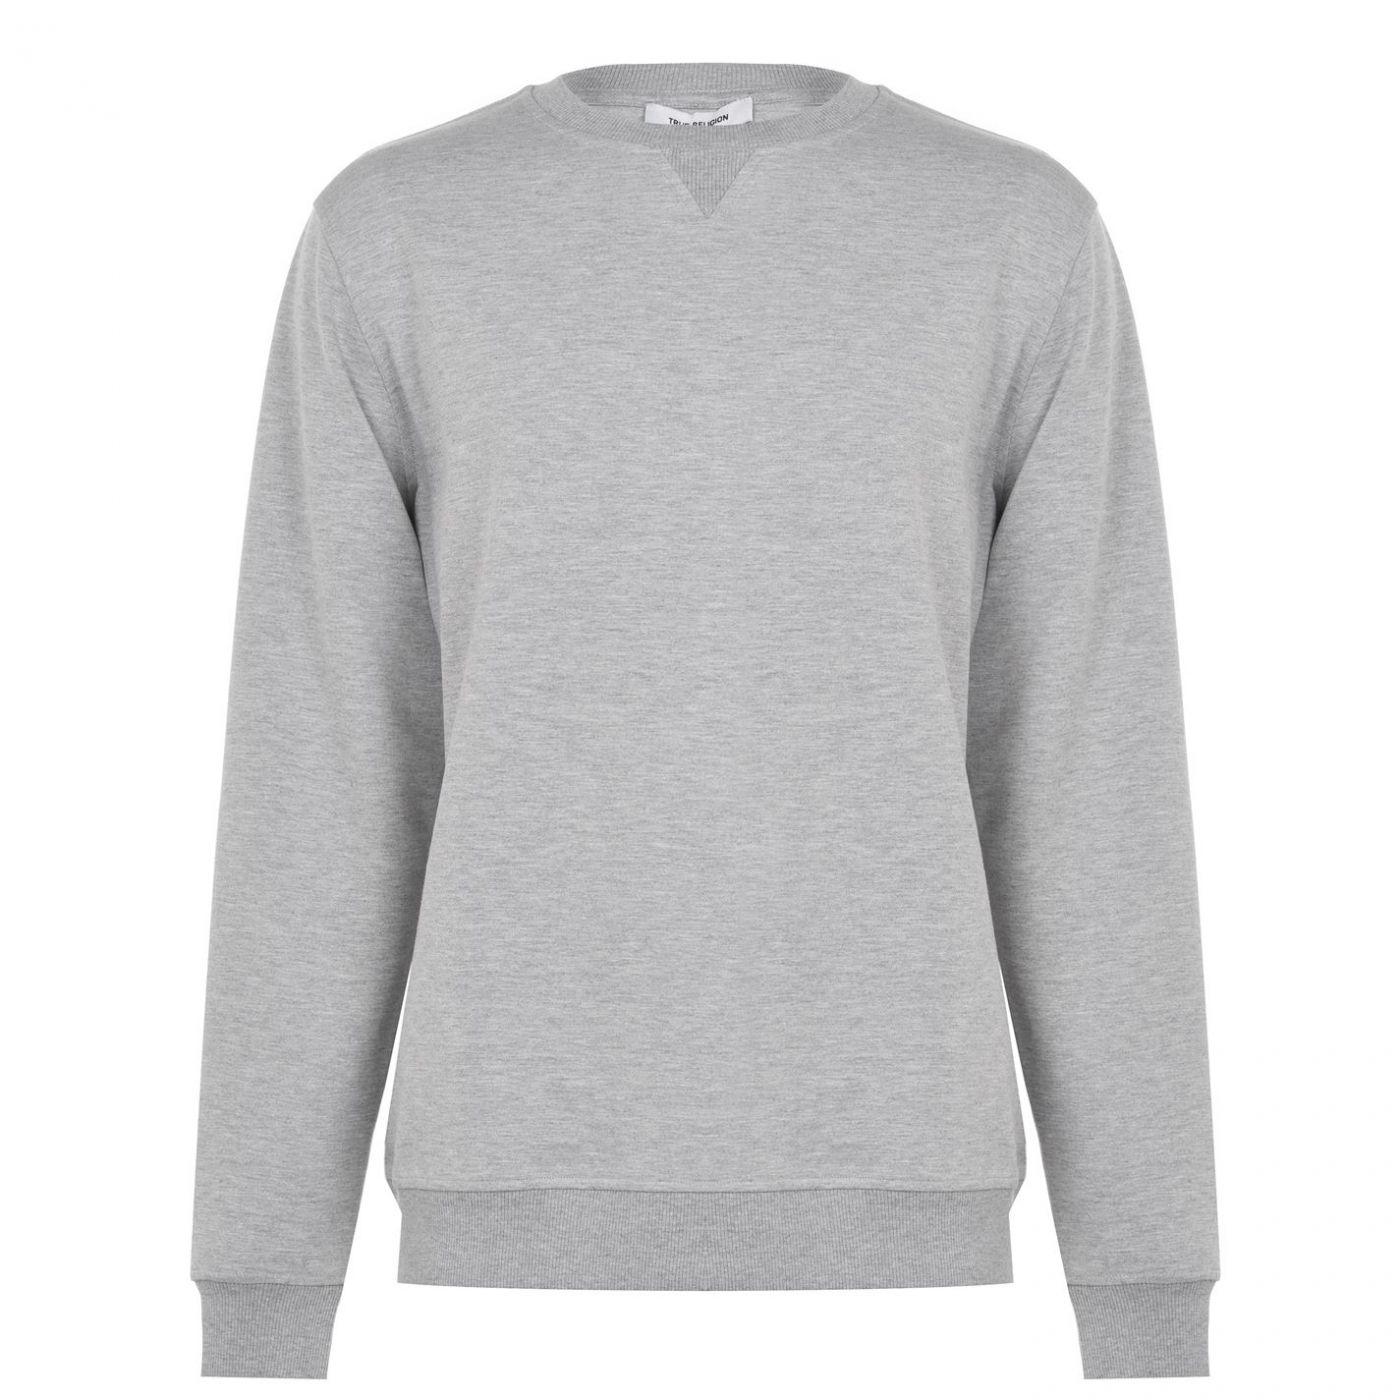 True Religion Horseshoe Sweatshirt